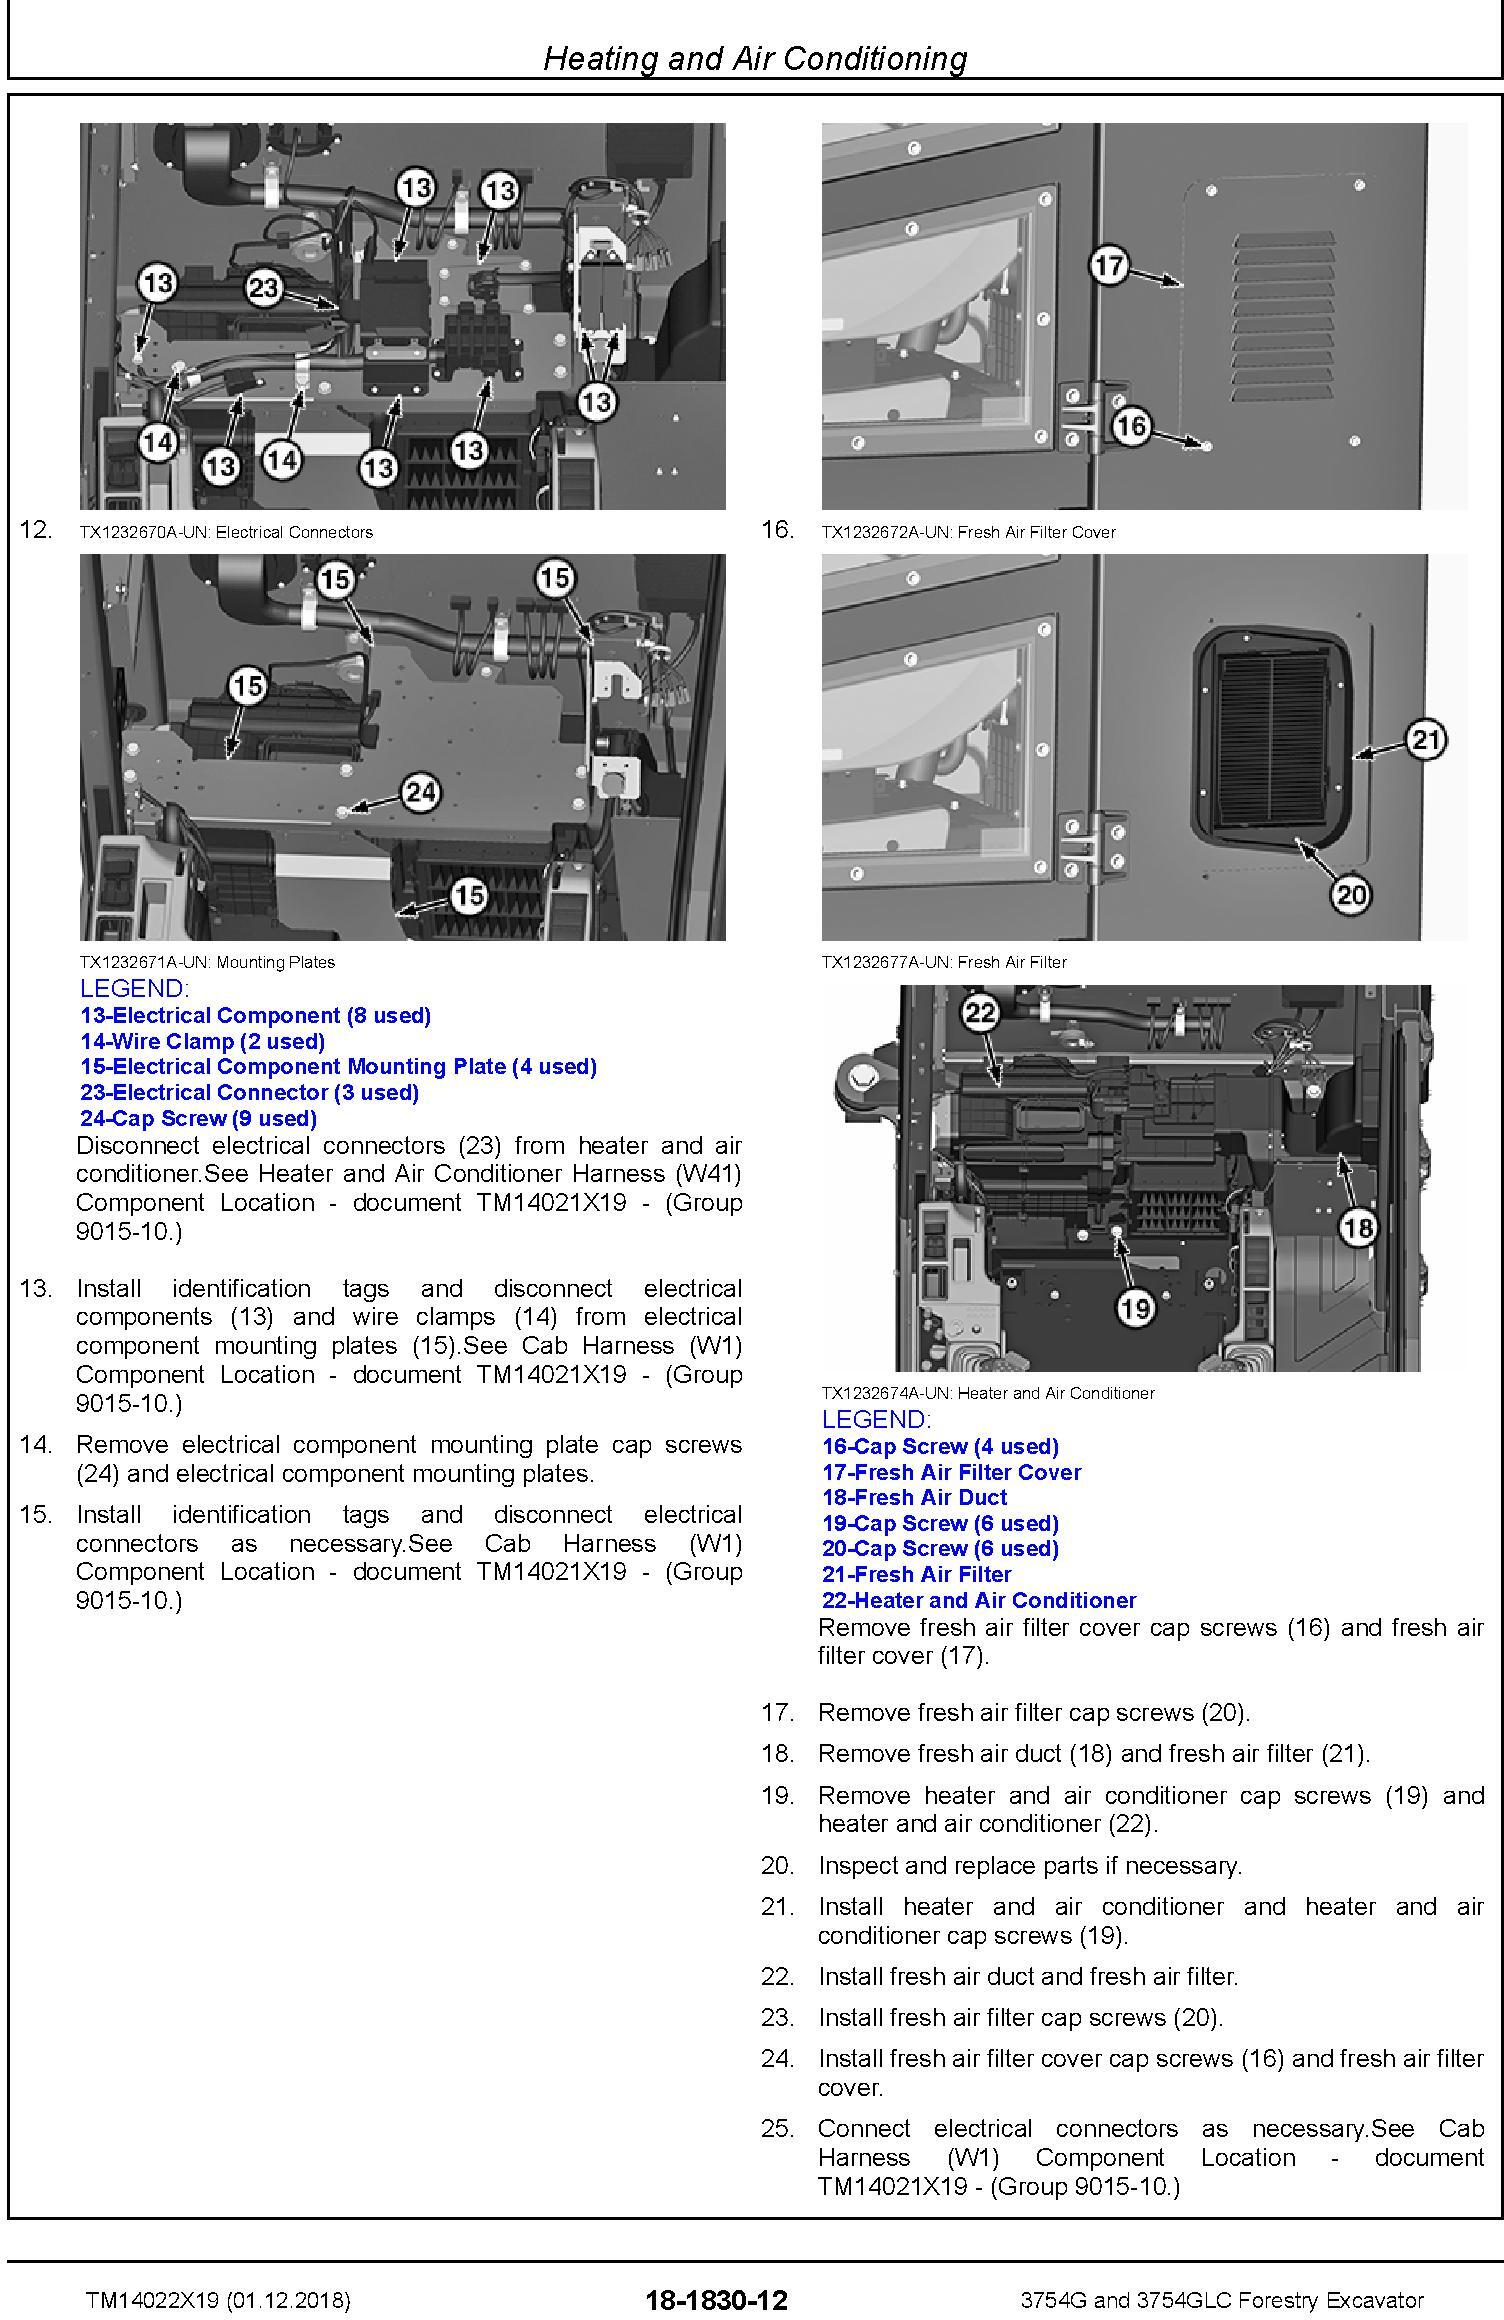 John Deere 3754G and 3754GLC (SN. F371001-) Forestry Excavator Repair Technical Manual (TM14022X19) - 3